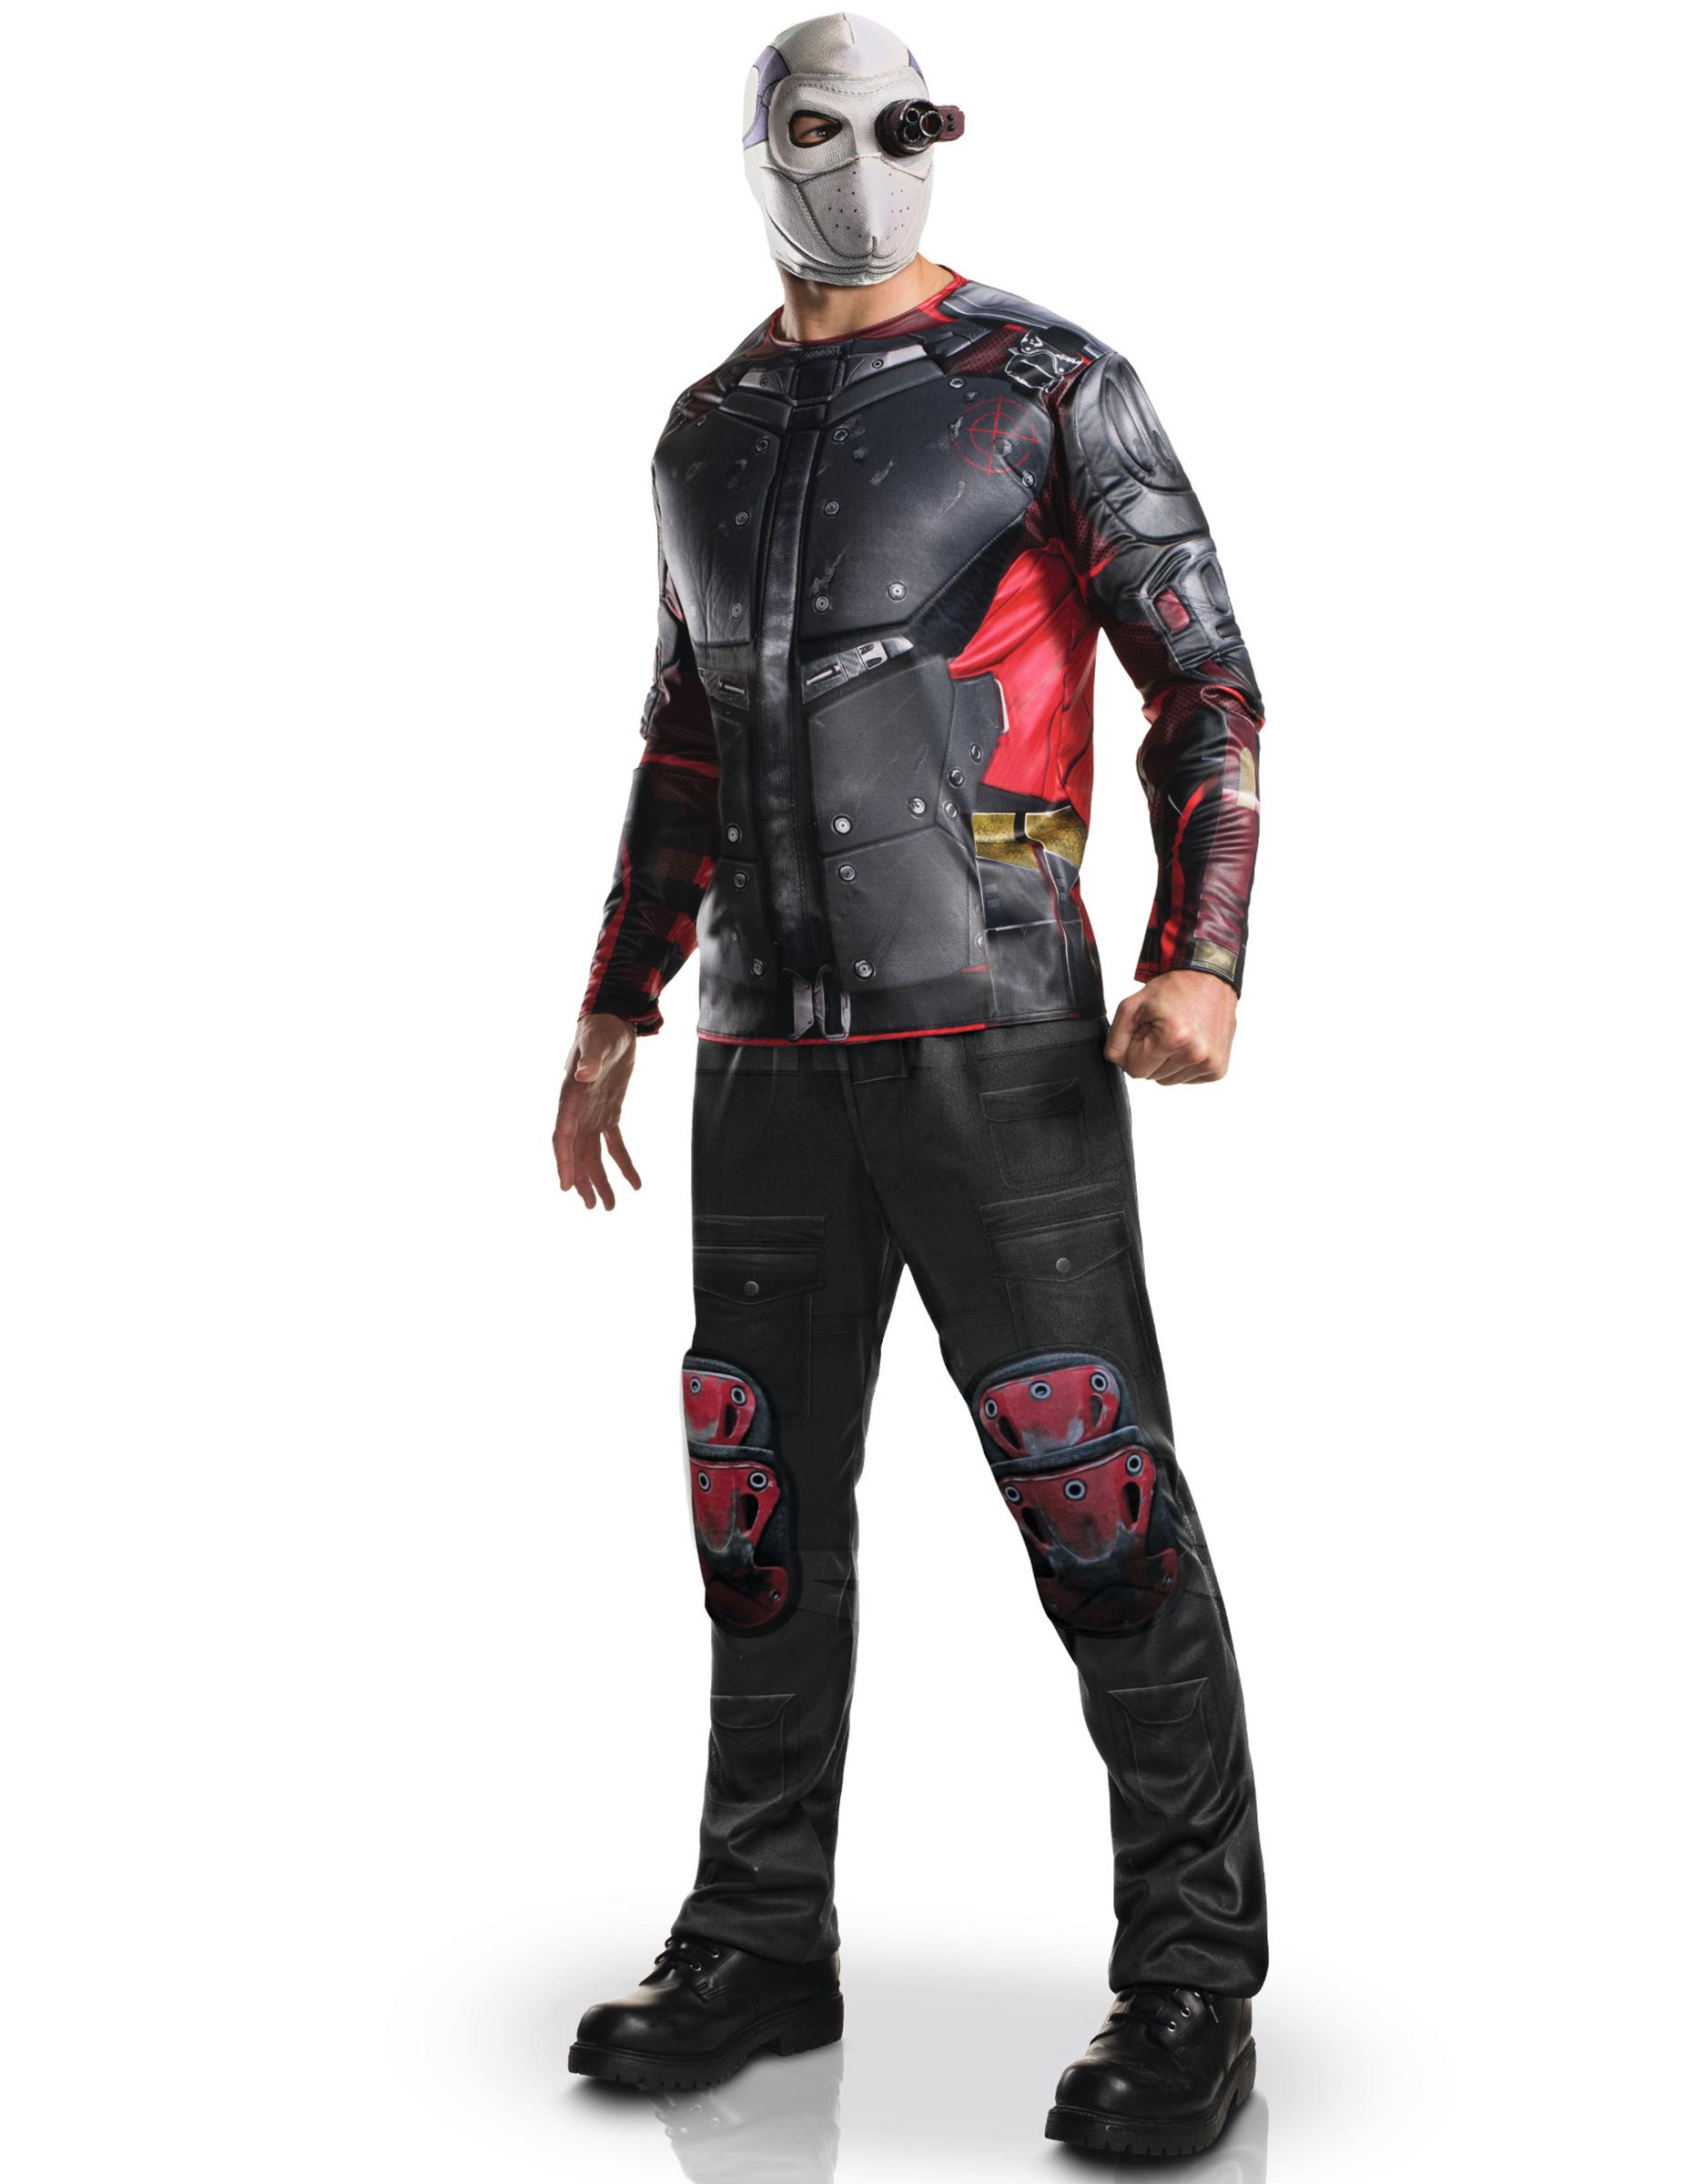 Déguisement Harley Quinn Suicide Squad Deguisetoi